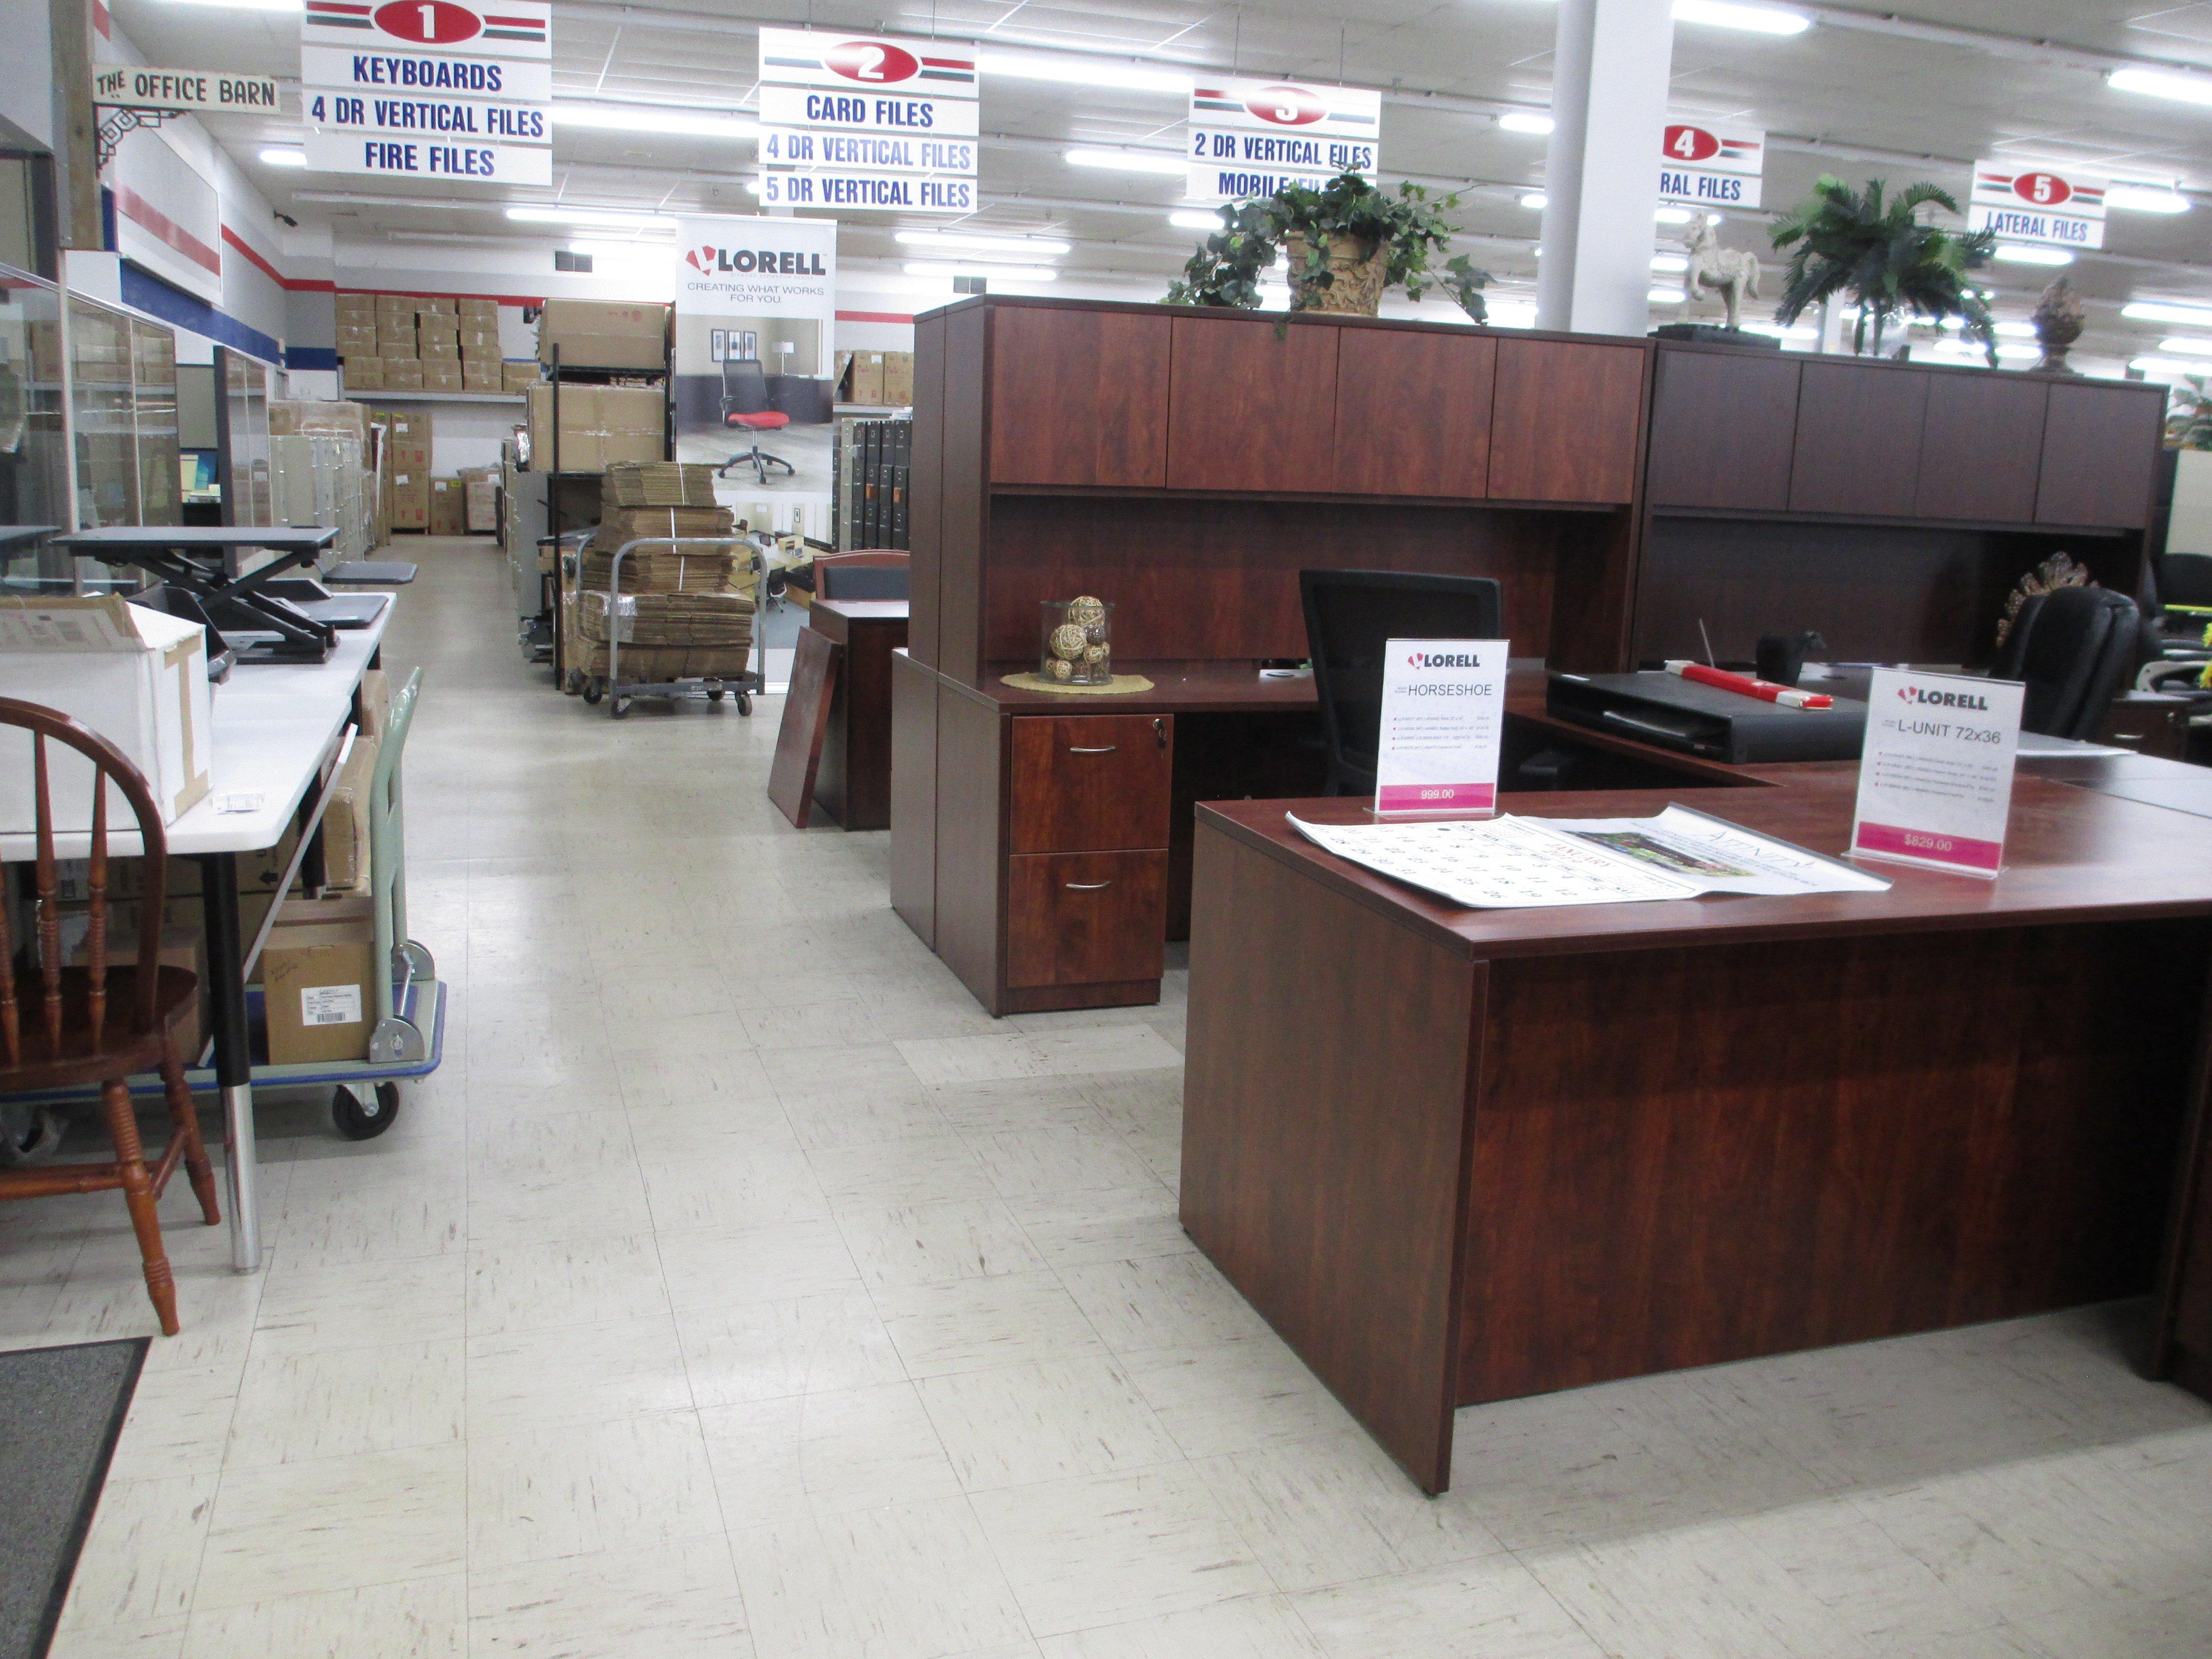 The Office Barn, Inc. - Home on